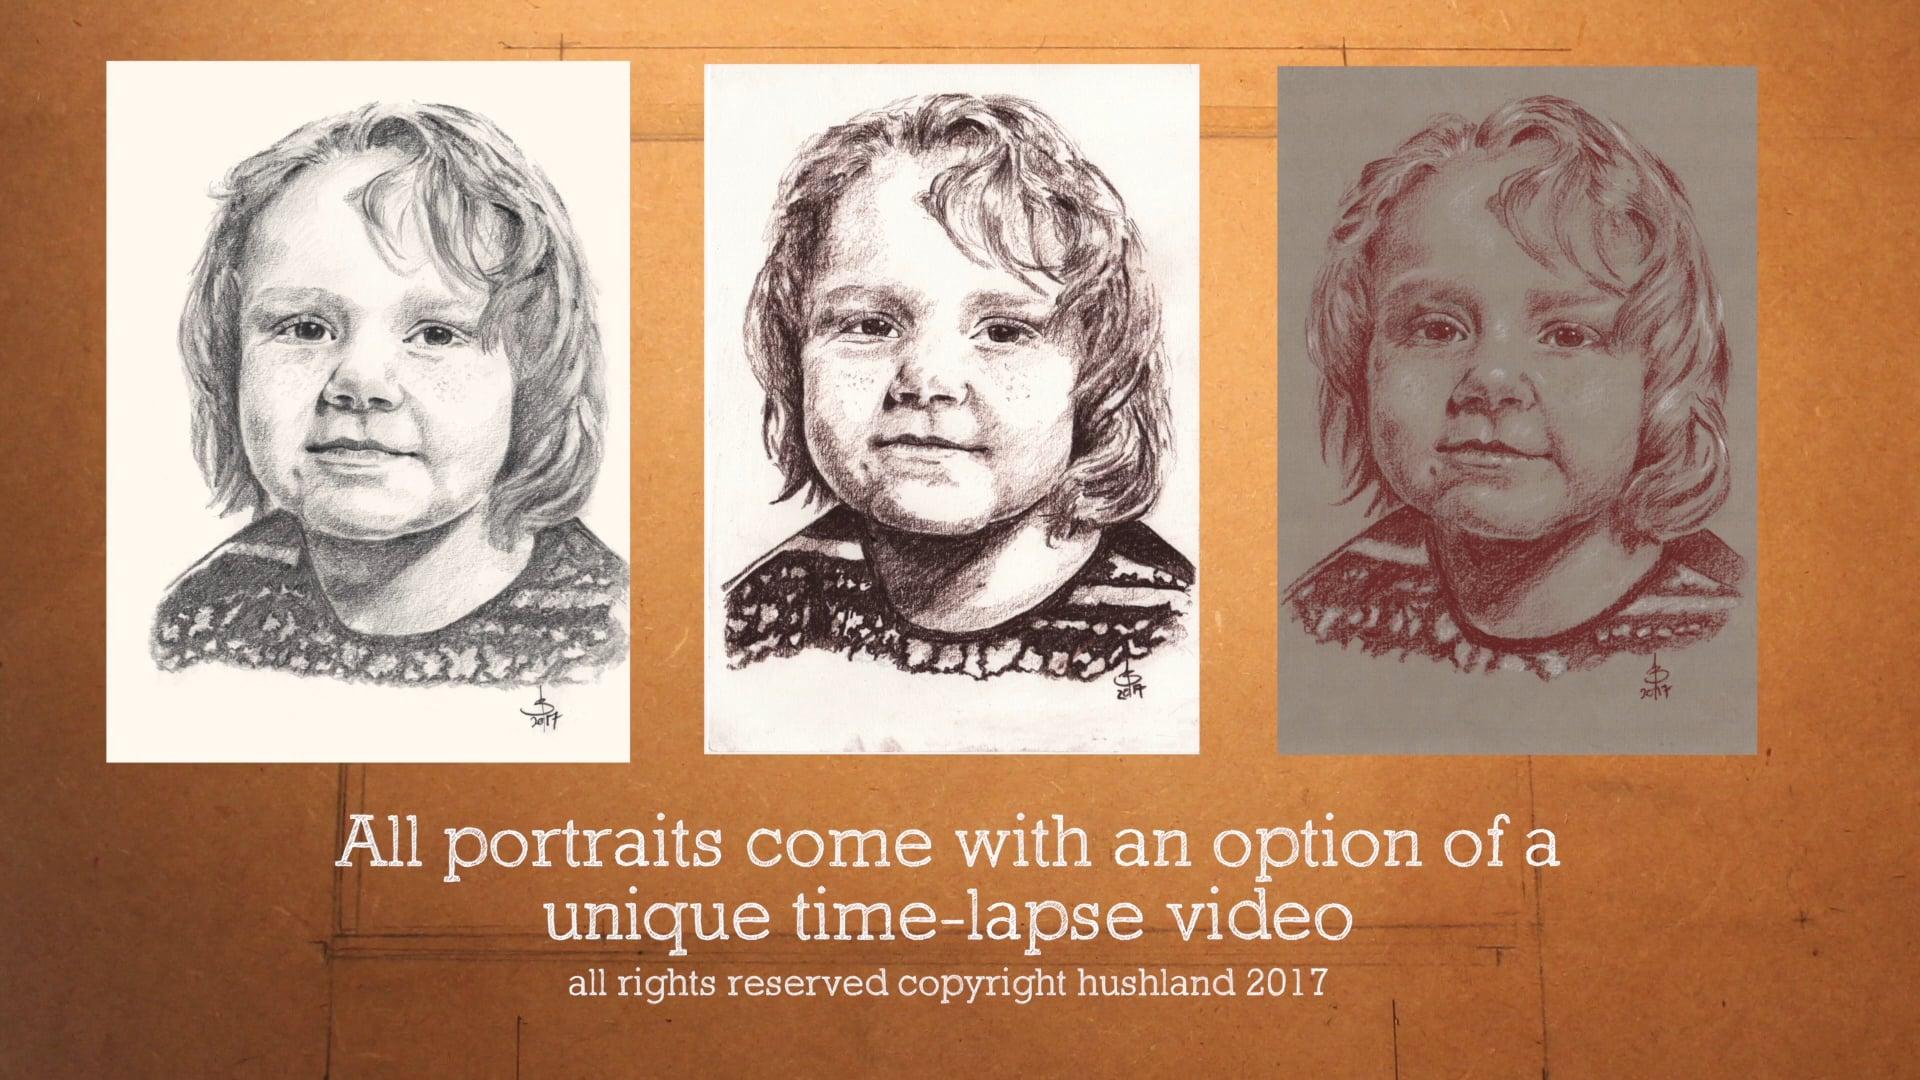 Hushland Portraits - An Introduction 2017